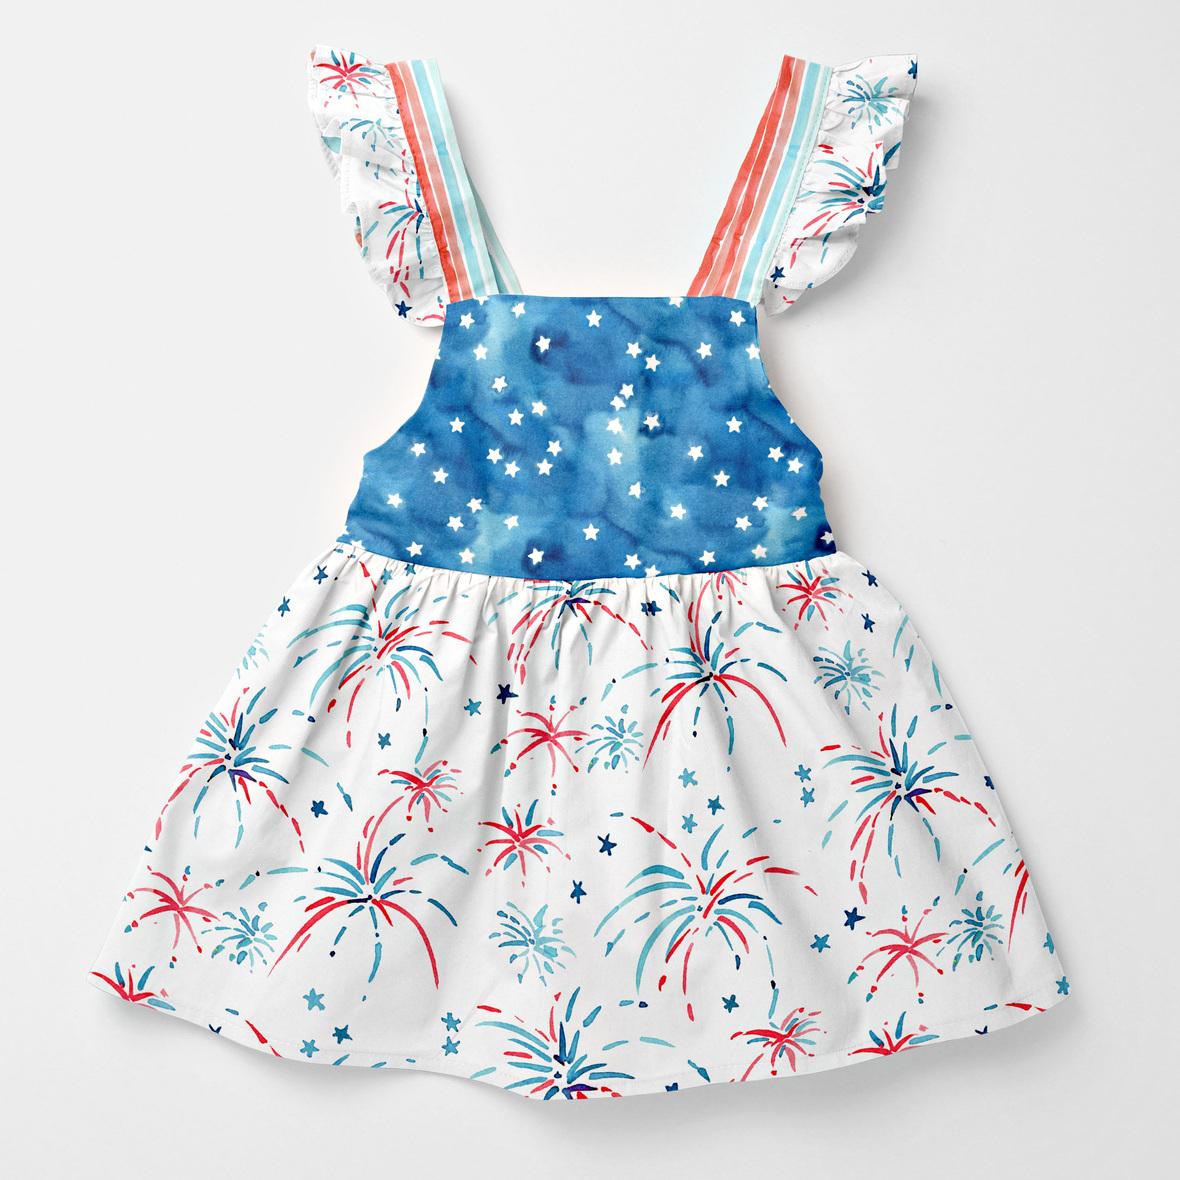 Baby-Dress-6